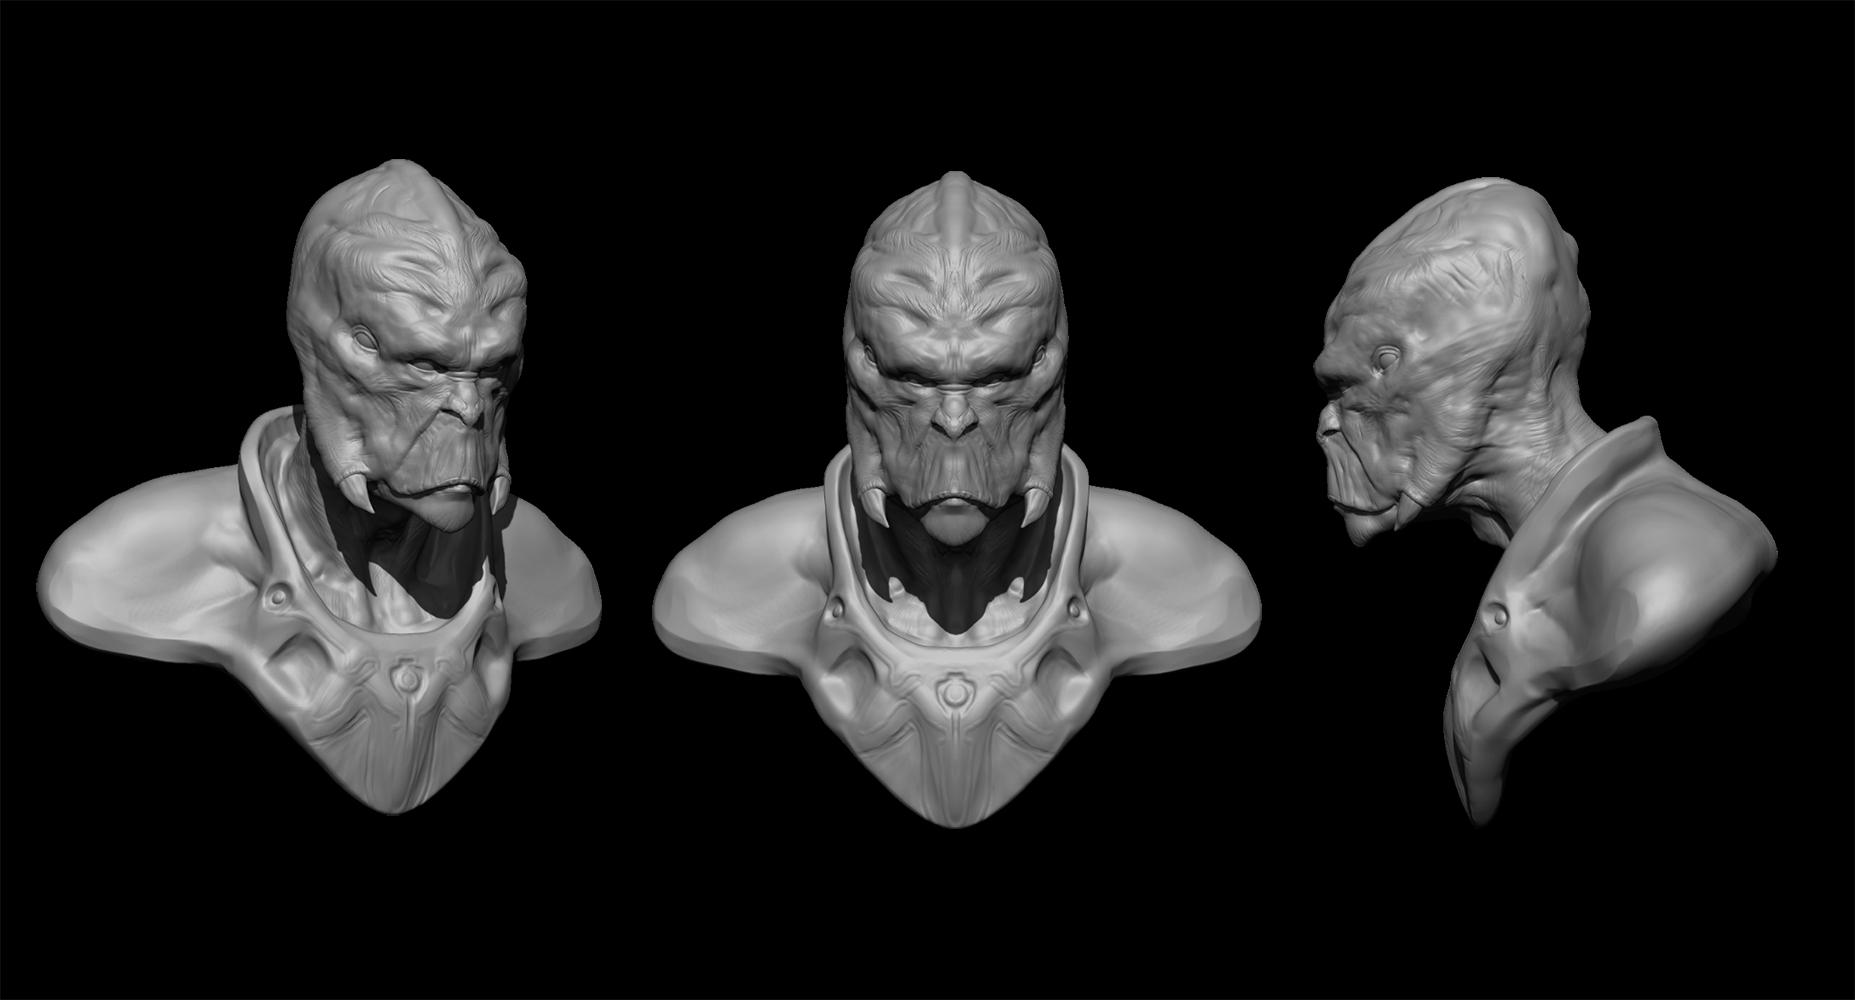 AlienCharacter-Bust_161101.jpg